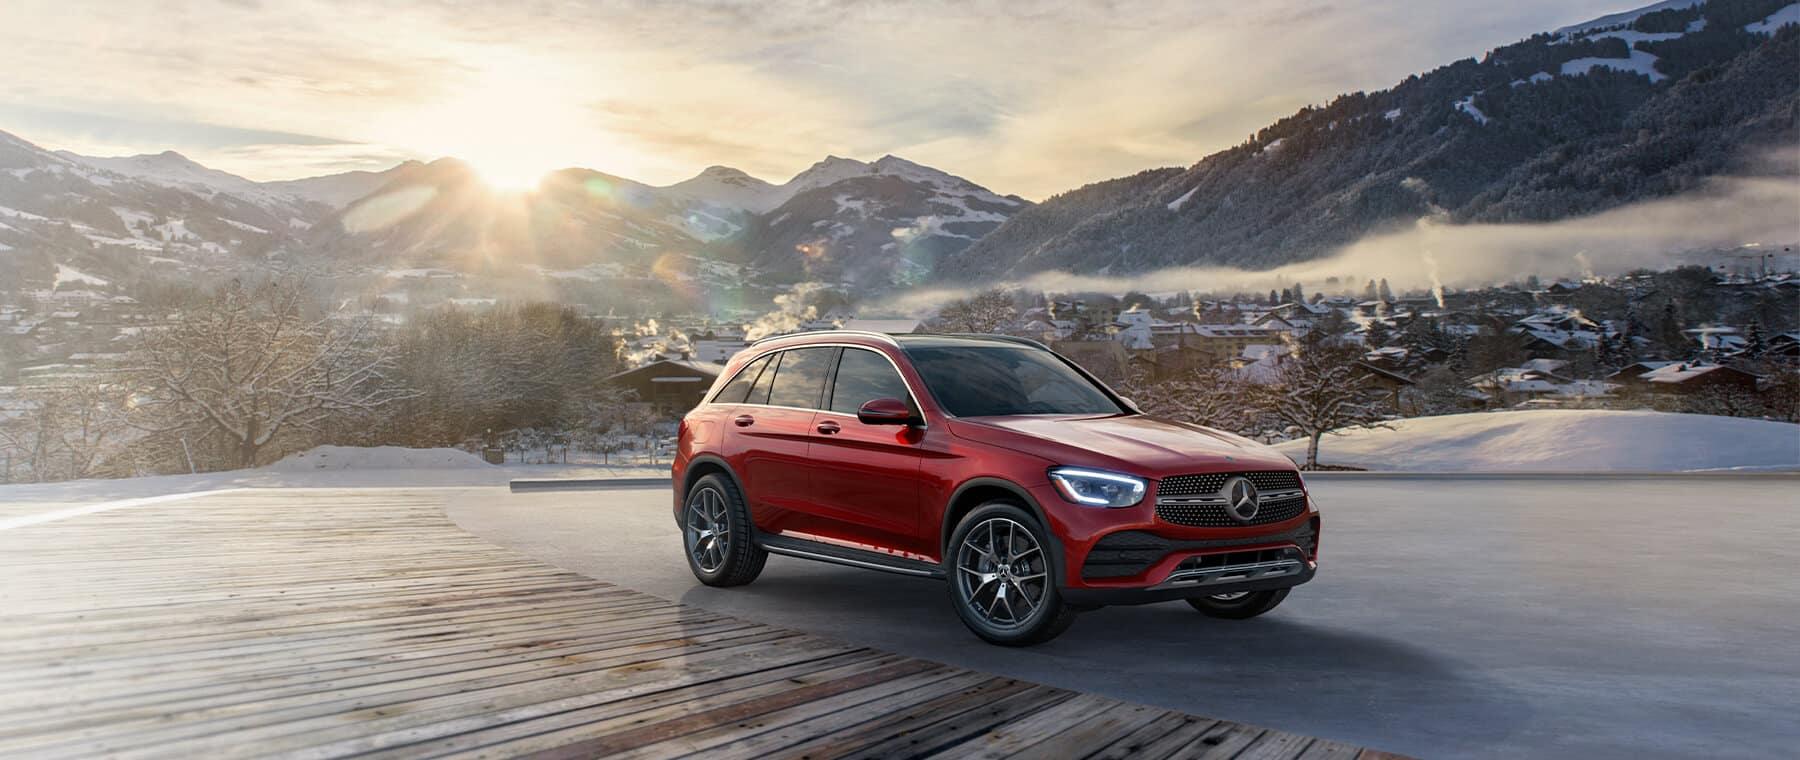 Mercedes-Benz Burlington January 2021 New Year New Offers